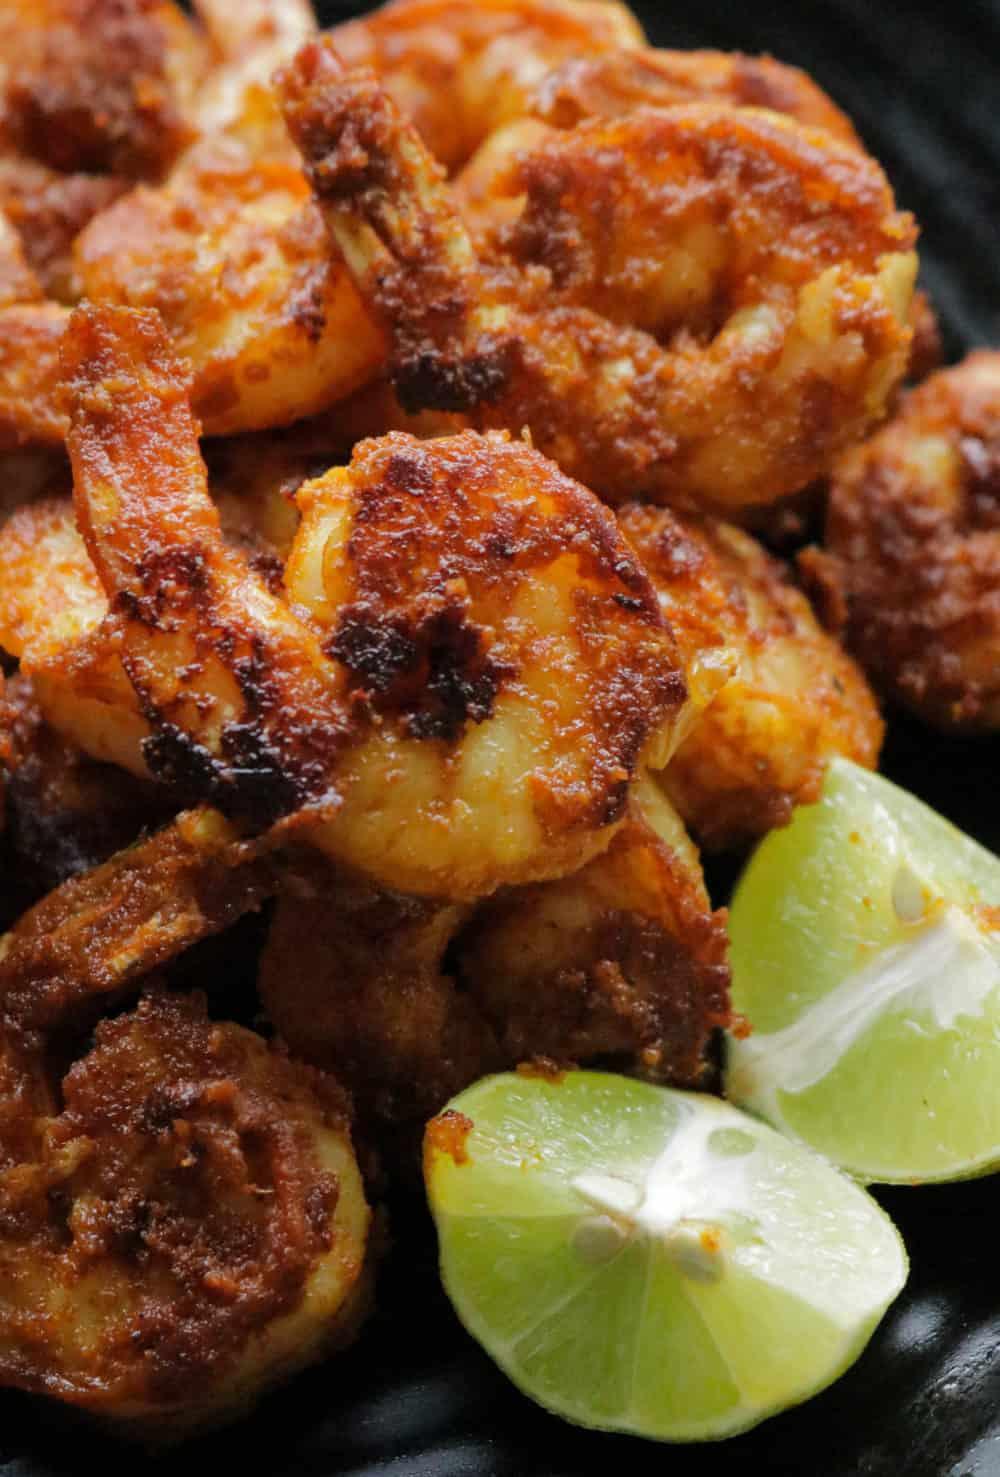 tandoori shrimp served in a platter.